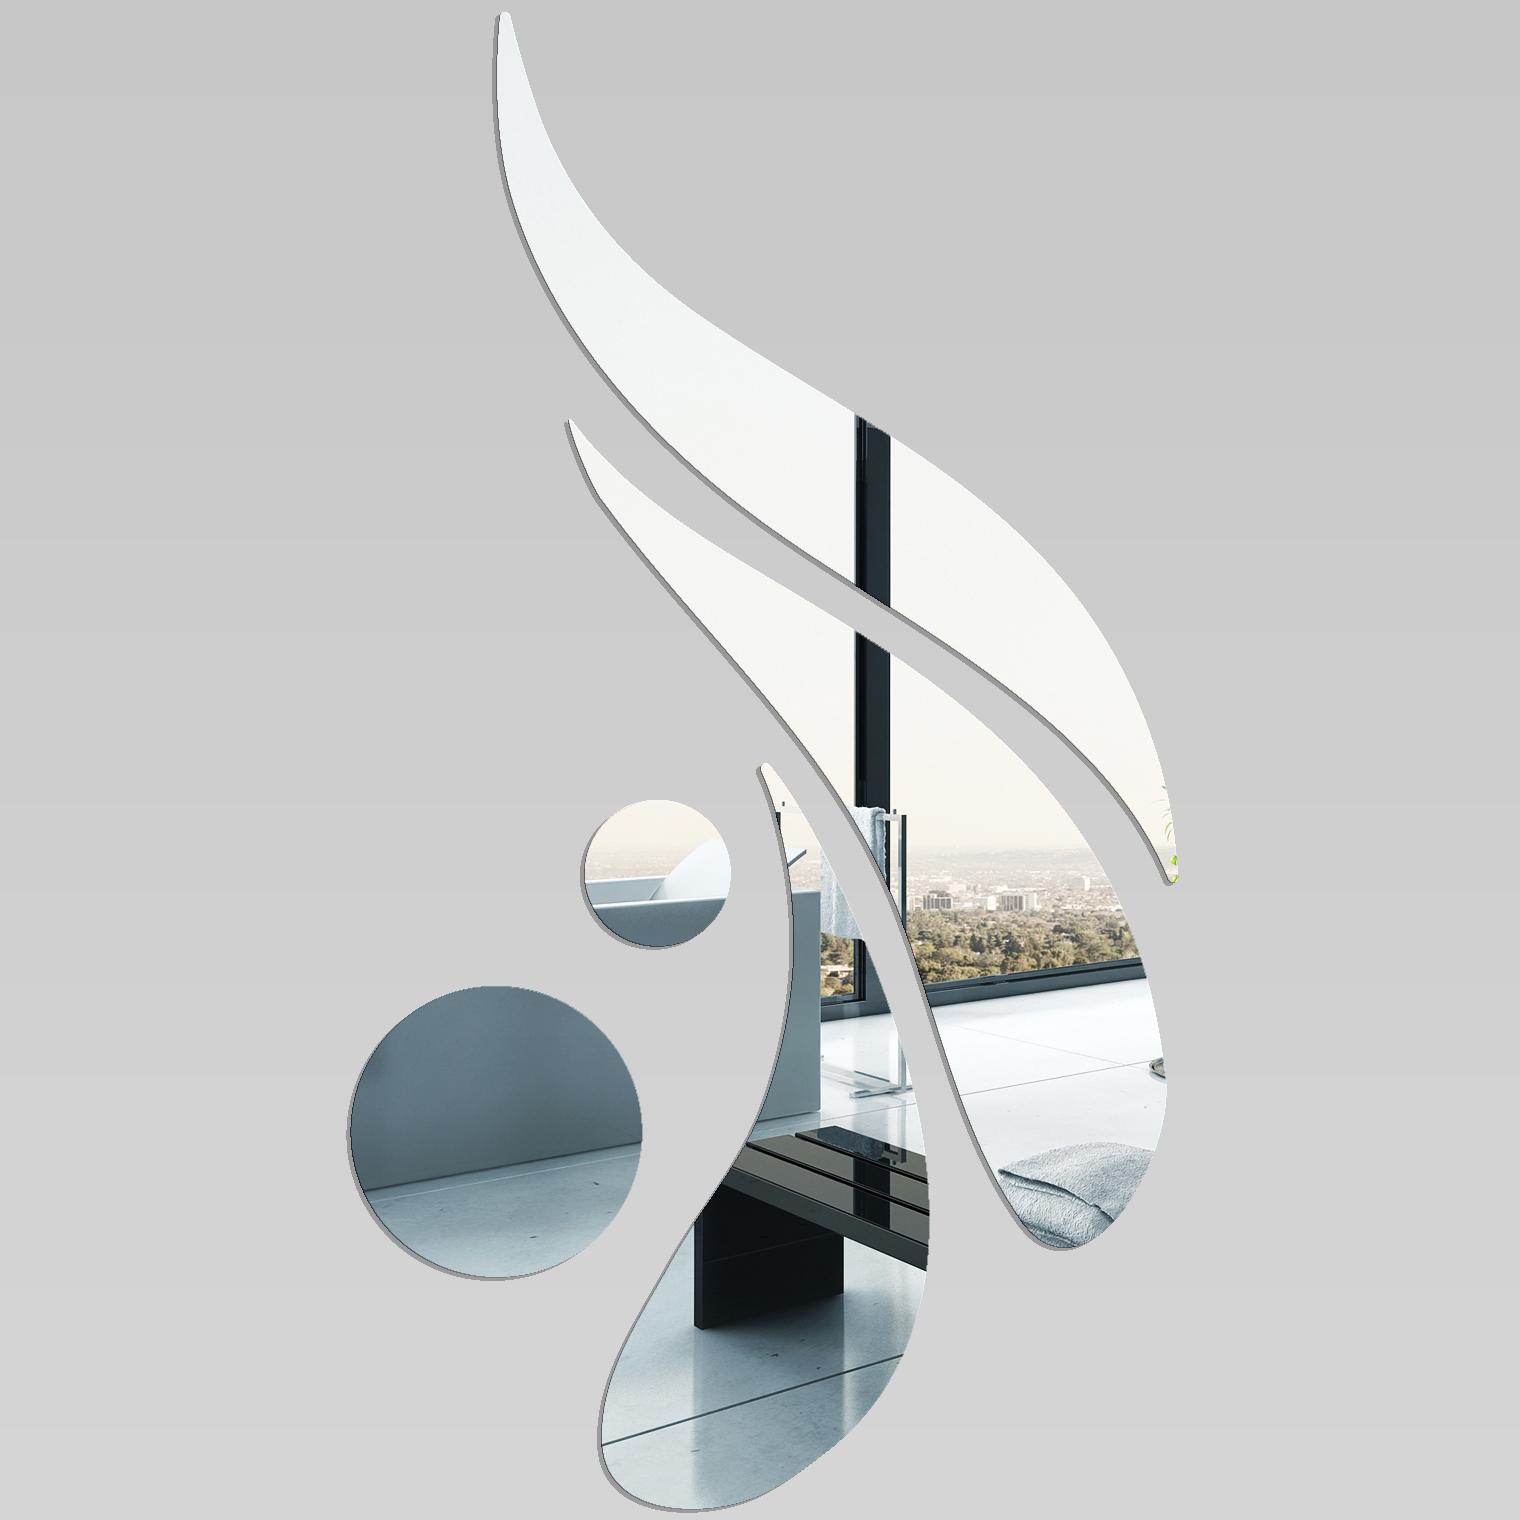 Wandtattoos folies wandspiegel aus acrylglas design - Wandspiegel design ...